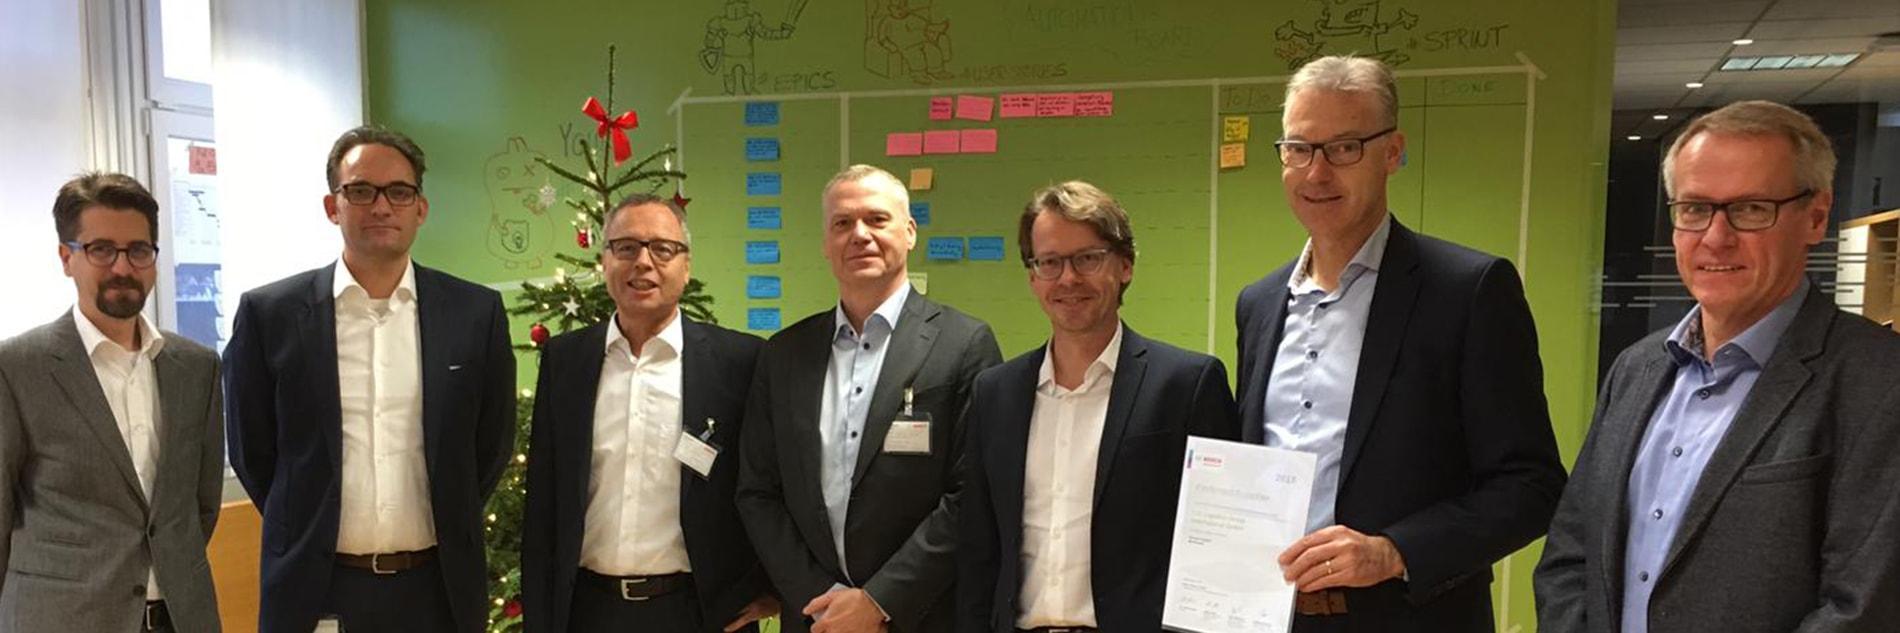 LGI-is-Prefered-Supplier-of-Bosch-GmbH